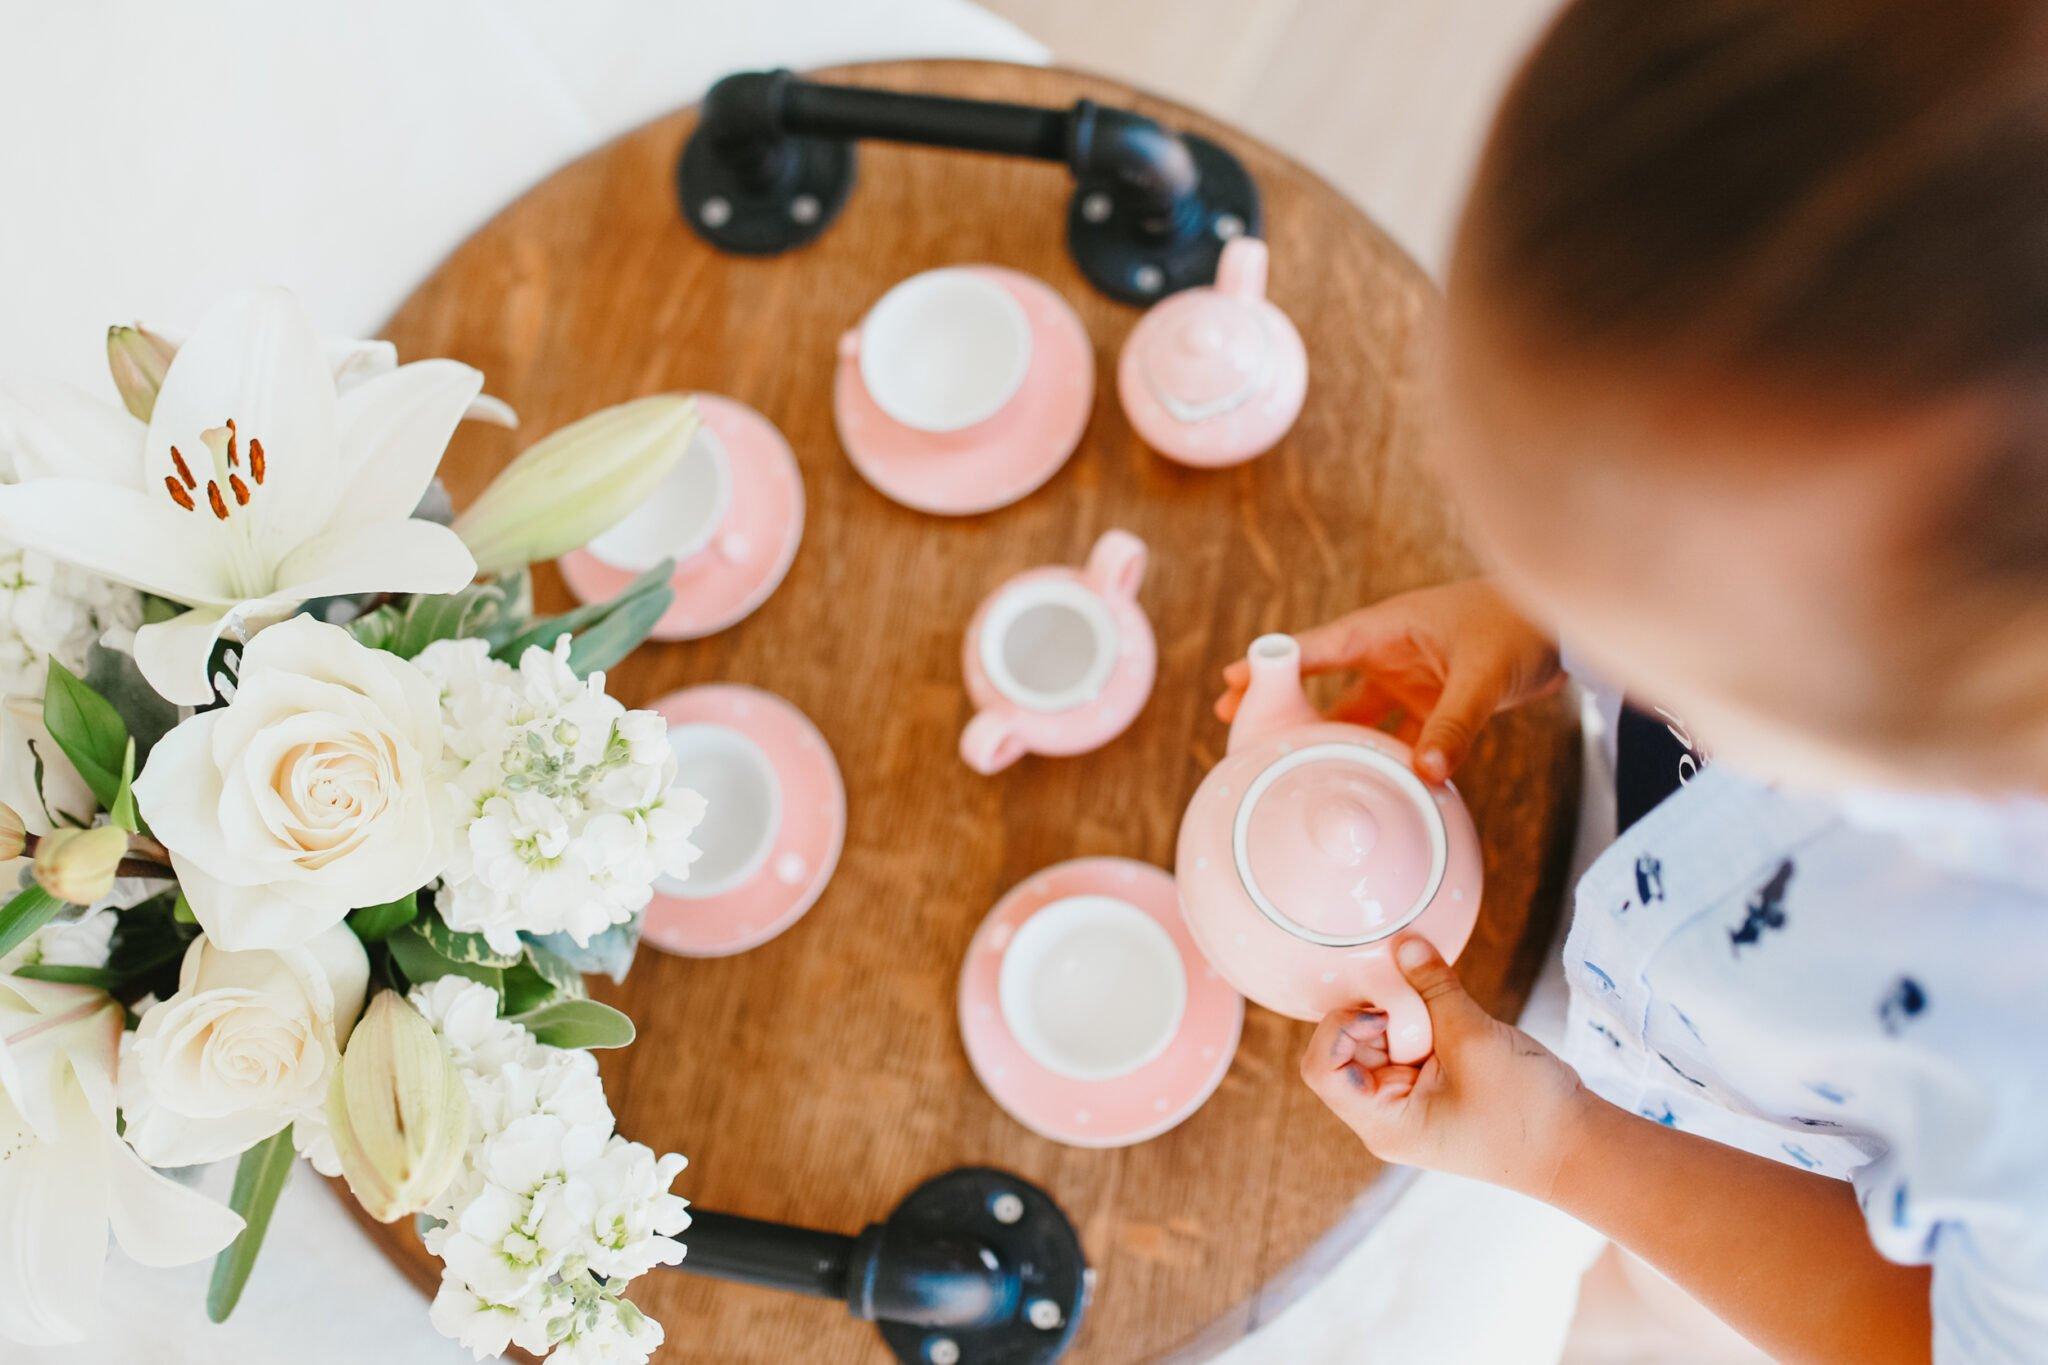 child with tea set